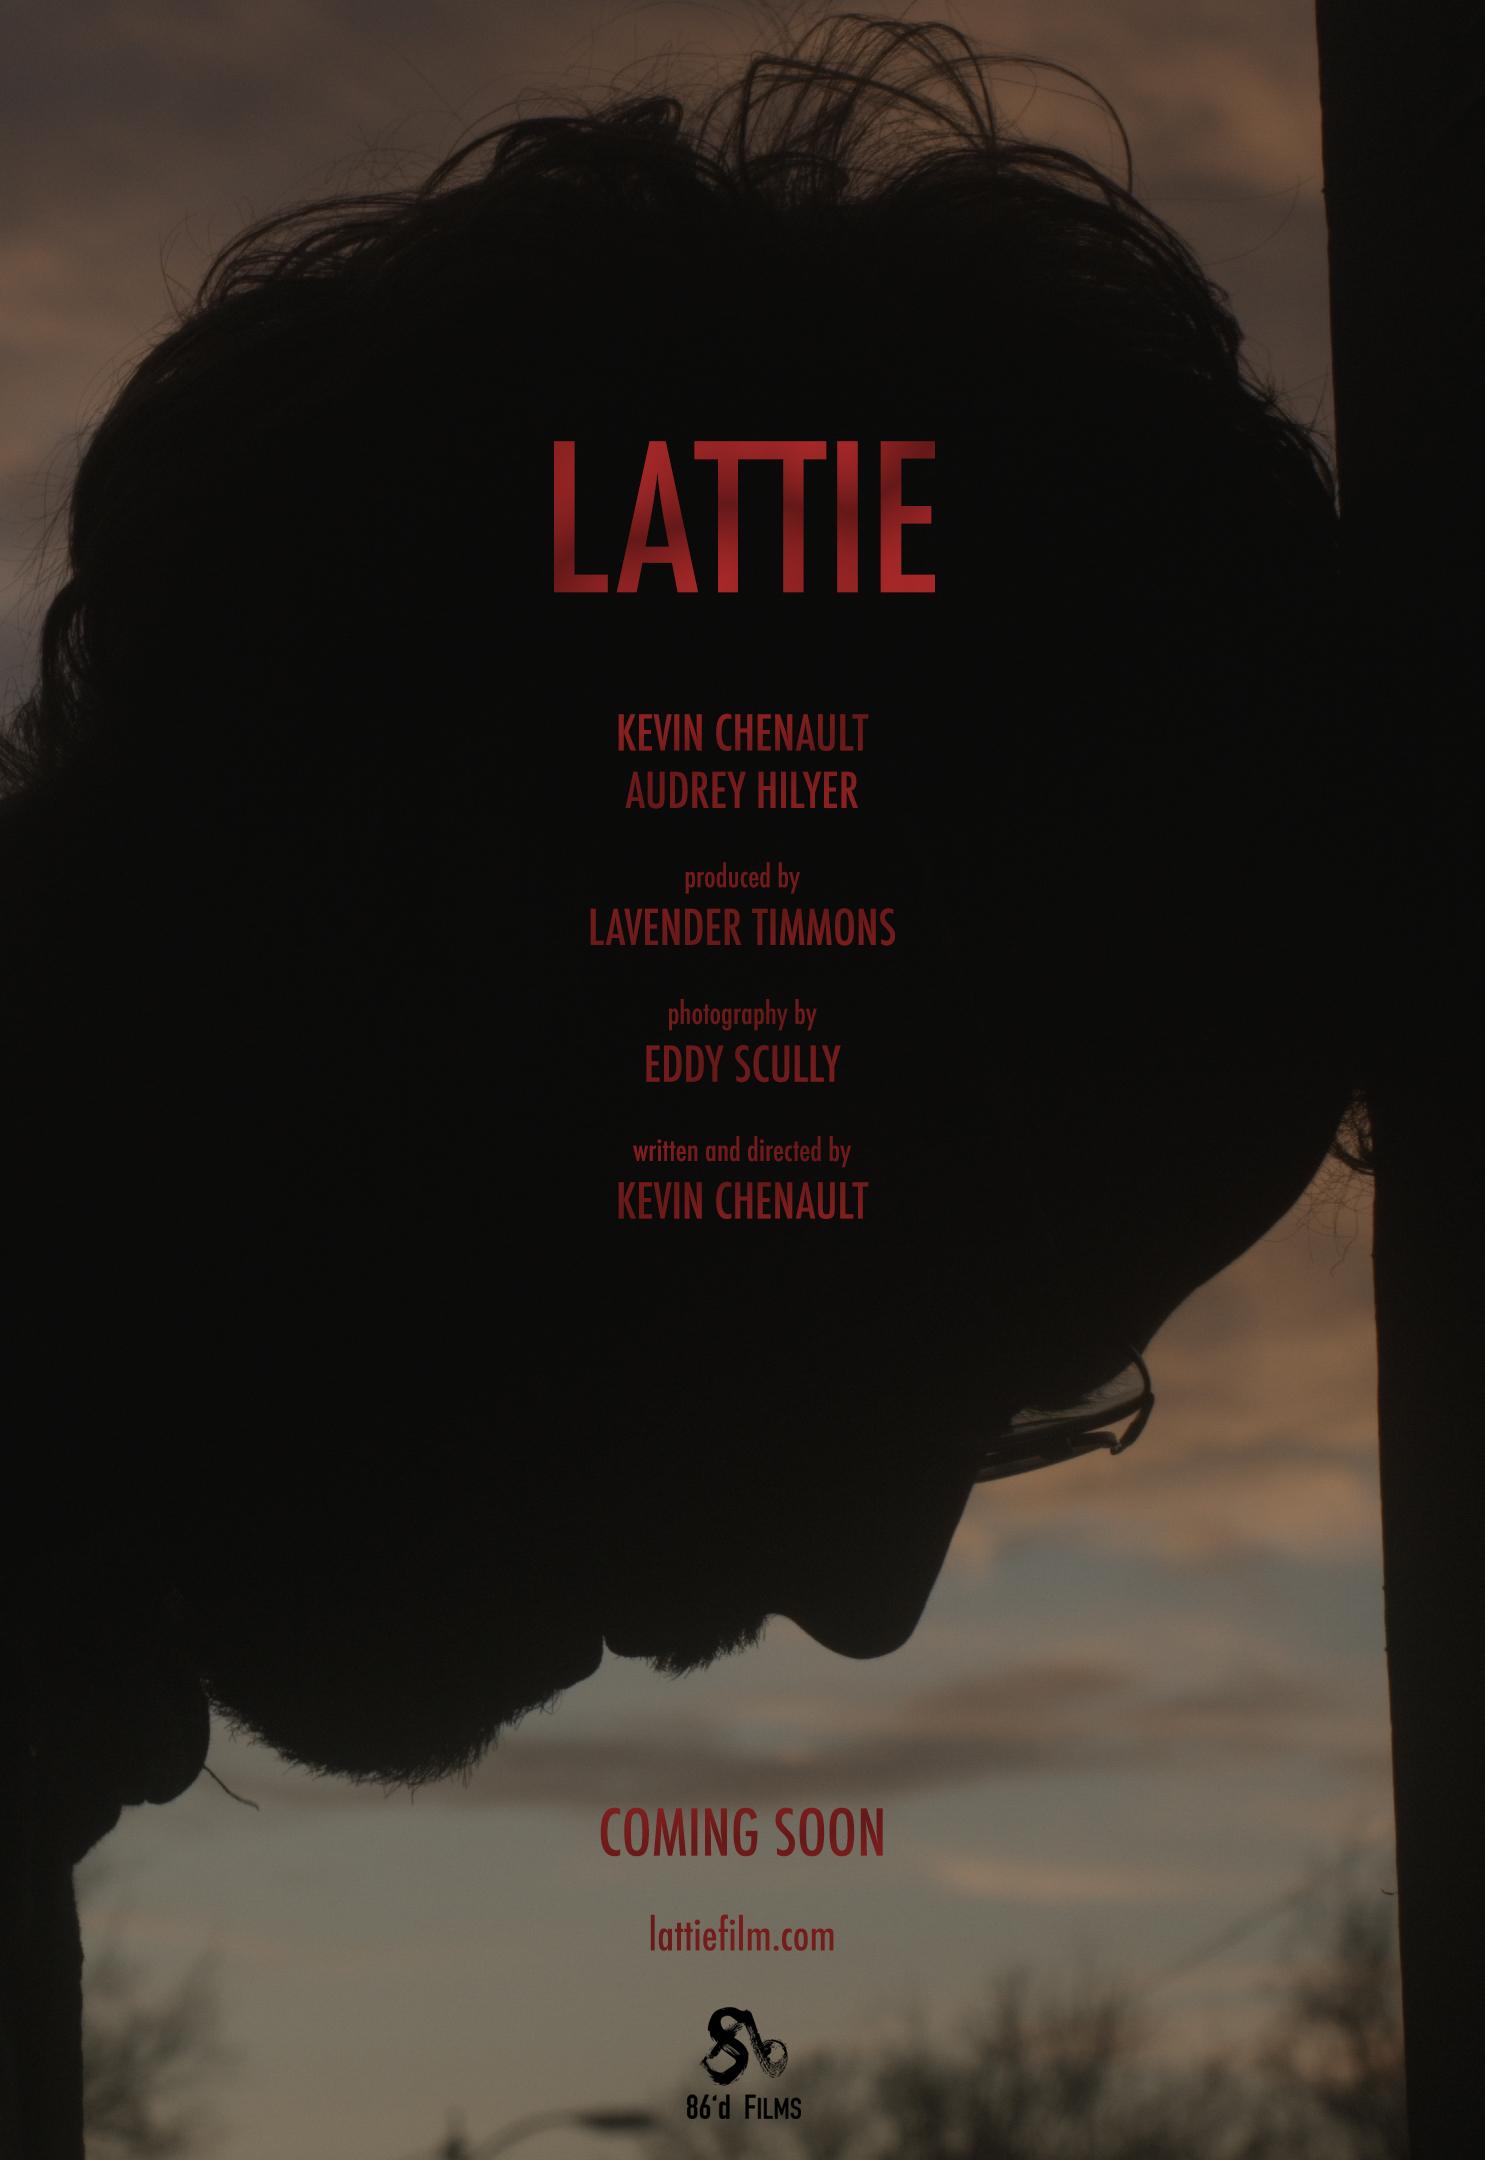 Lattie poster 3.jpg